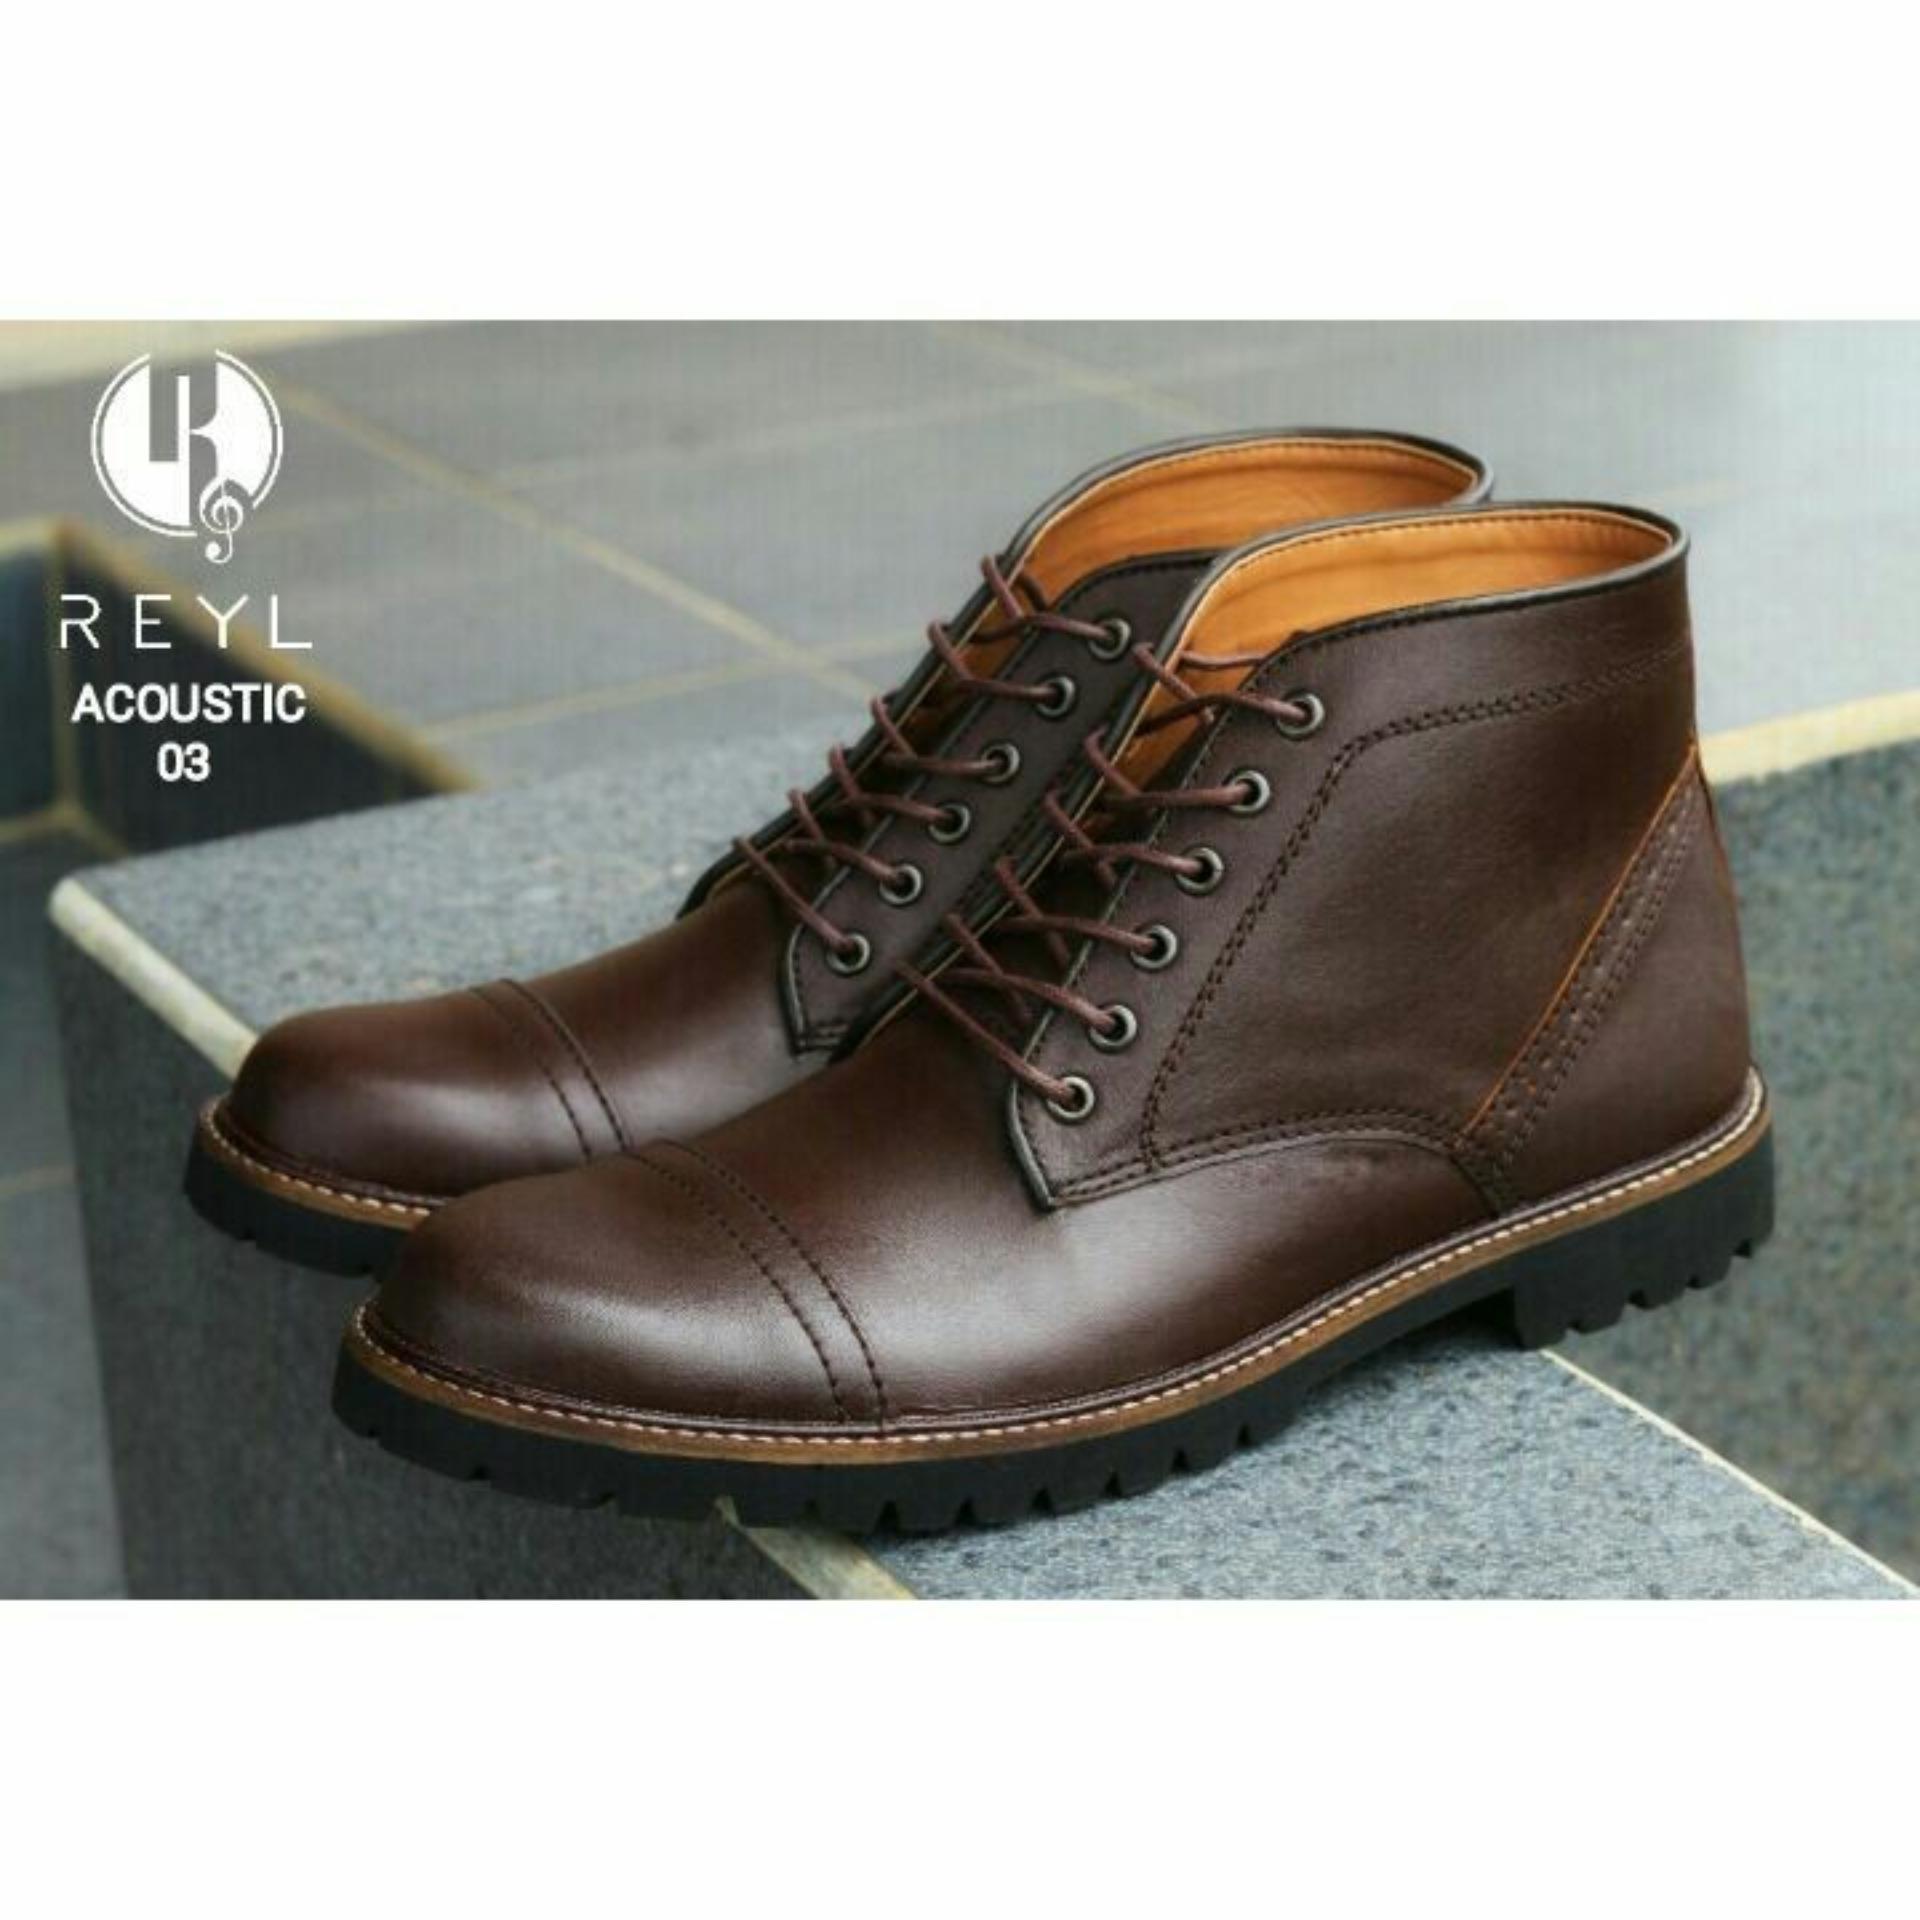 Penawaran Istimewa Sepatu Boots Reyl Accoustic Safety Terbaru